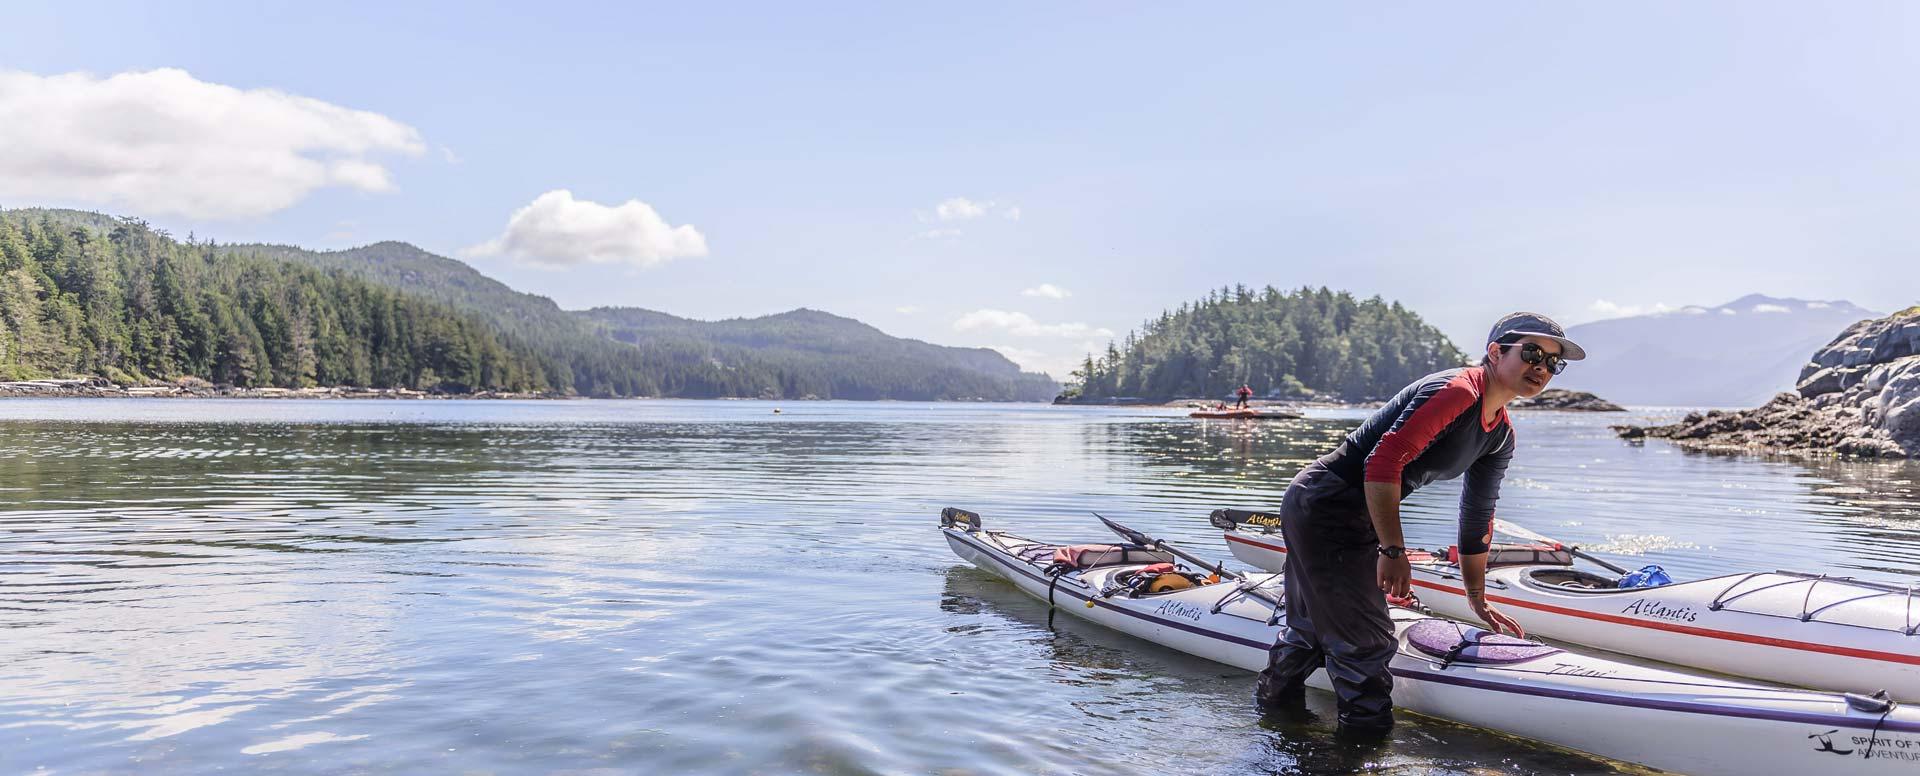 Packing list for kayaking